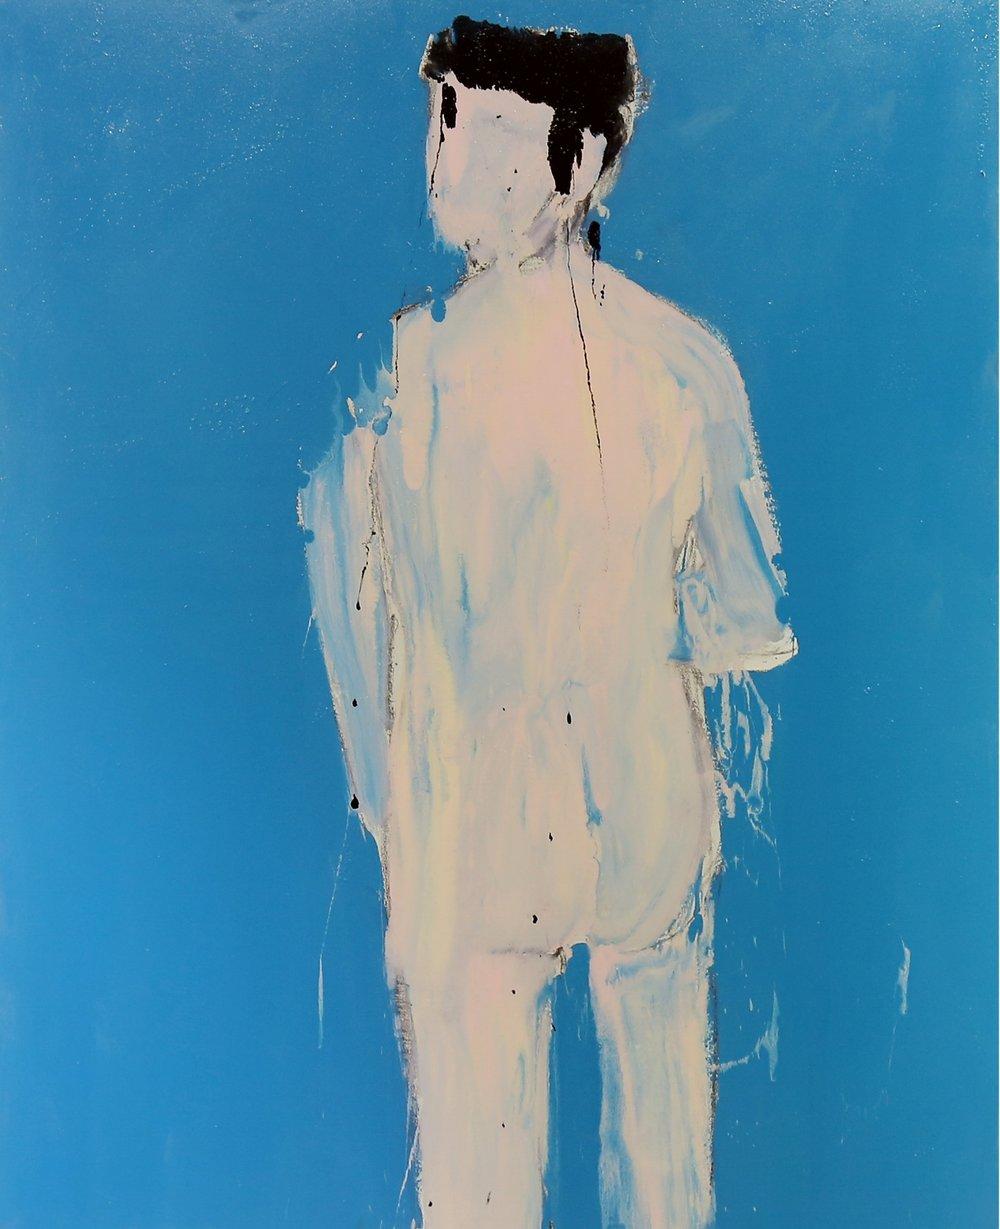 Nude I, 2016, enamel paint on canvas, 168 x 137 cm